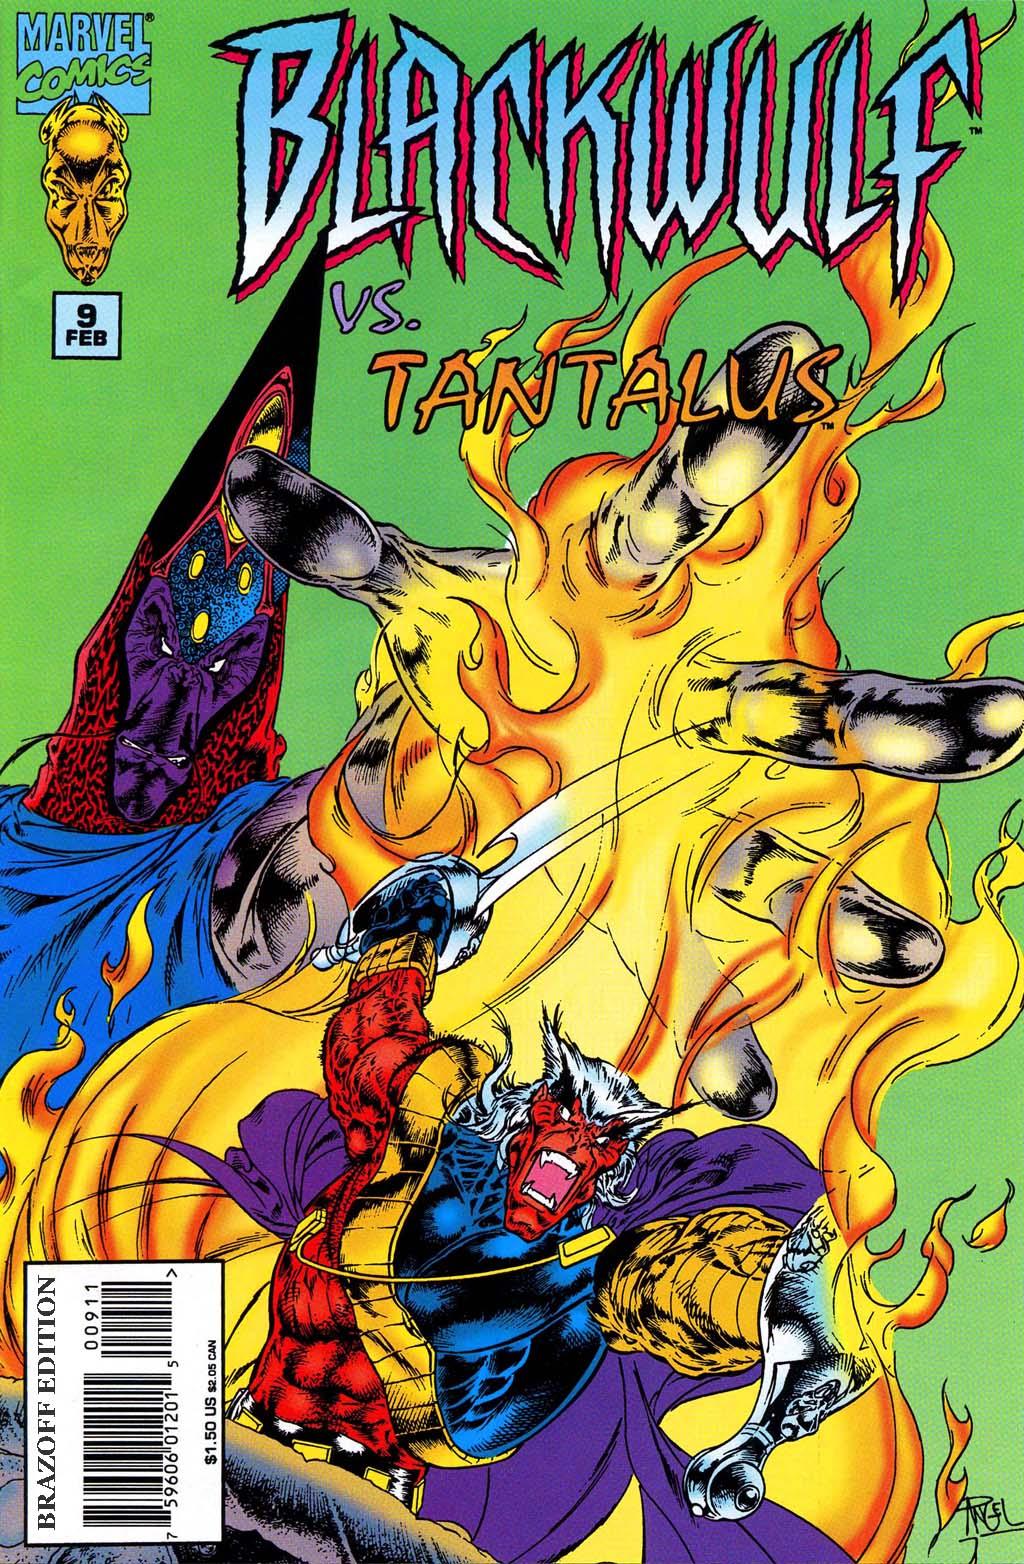 Read online Blackwulf comic -  Issue #9 - 1